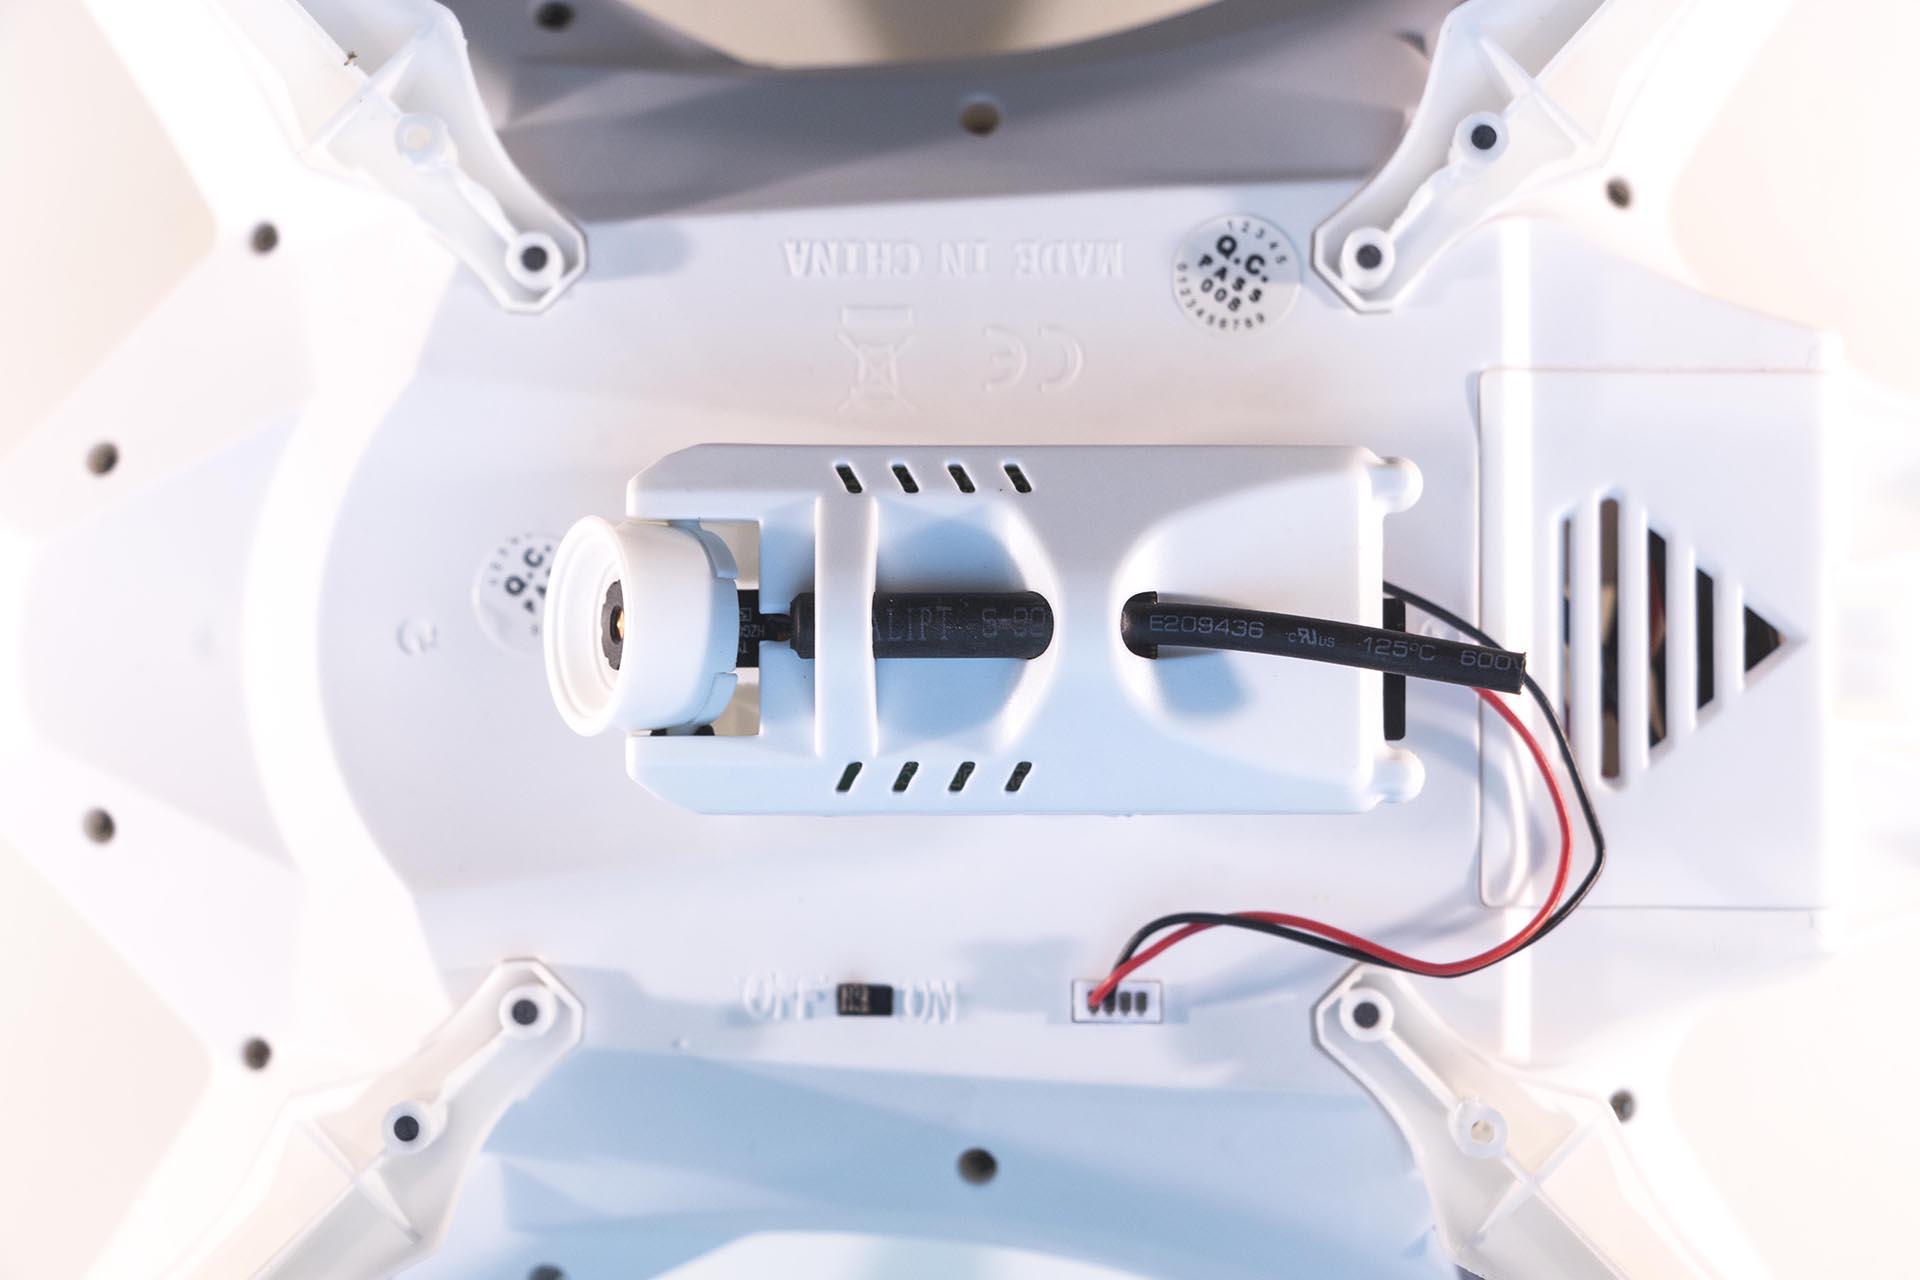 UDI RC Lark FPV Drone_MG_8329